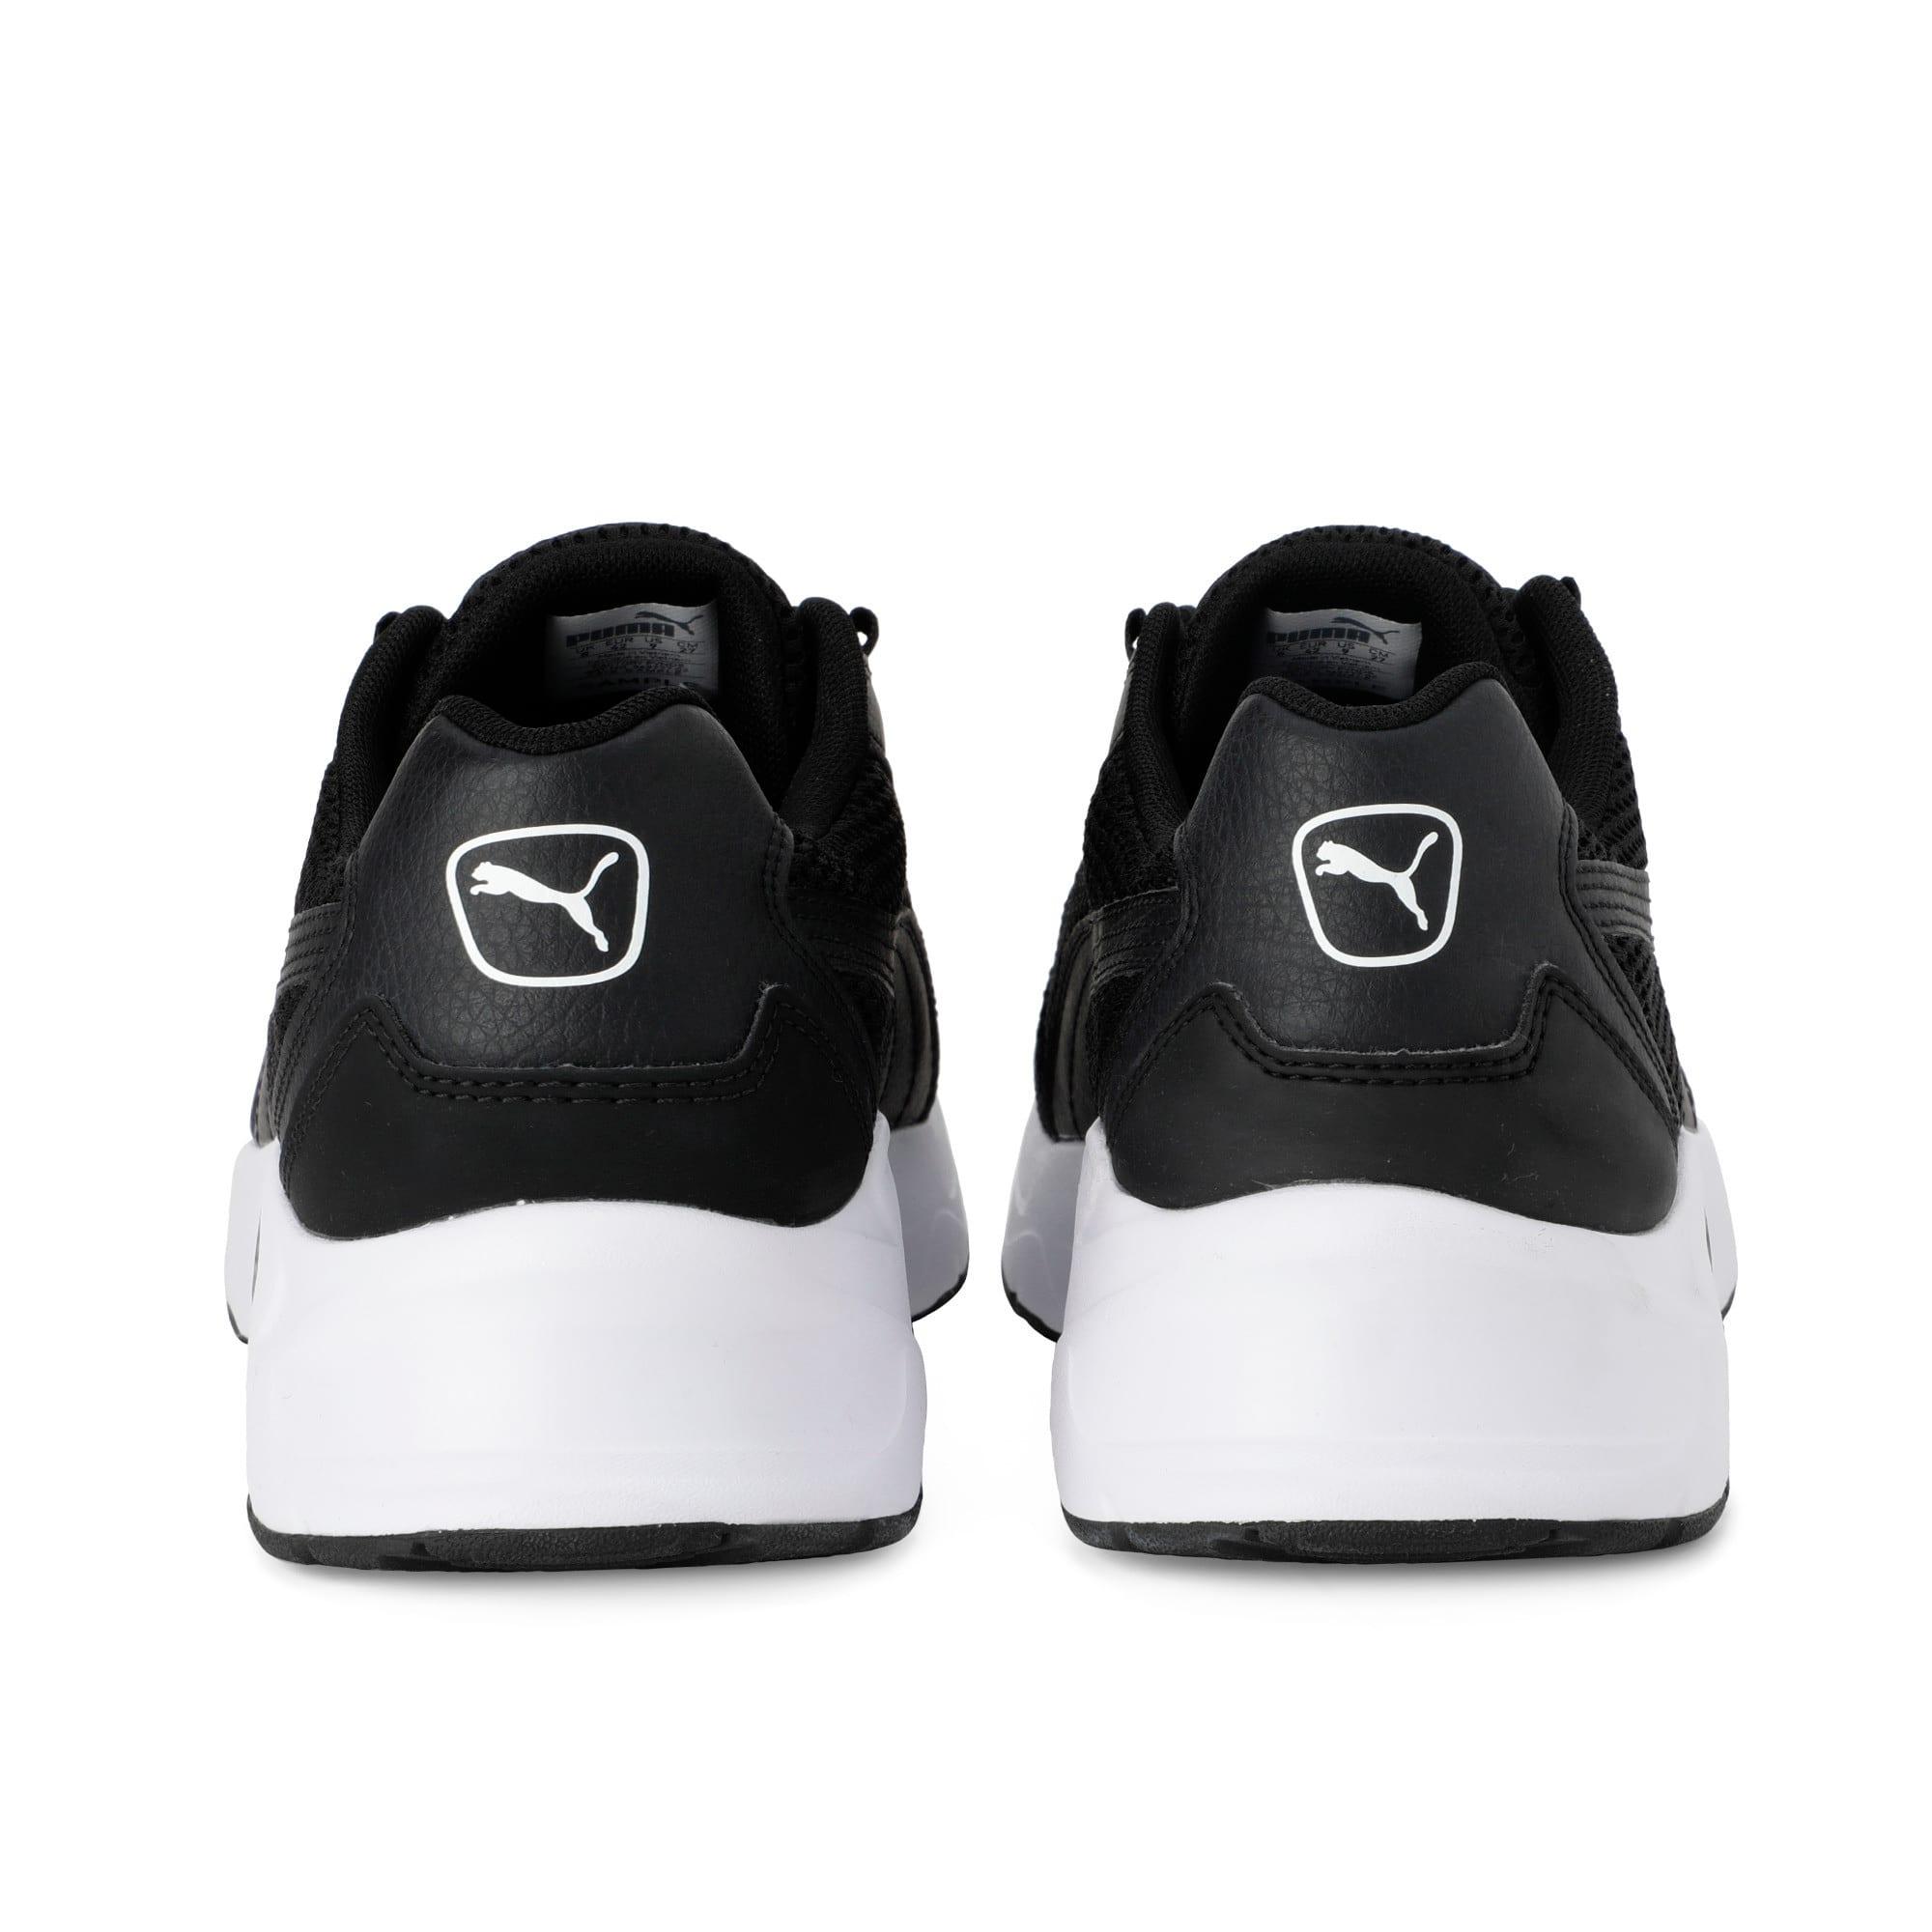 Thumbnail 5 of Nucleus Training Shoes, Puma Black-Puma Black, medium-IND